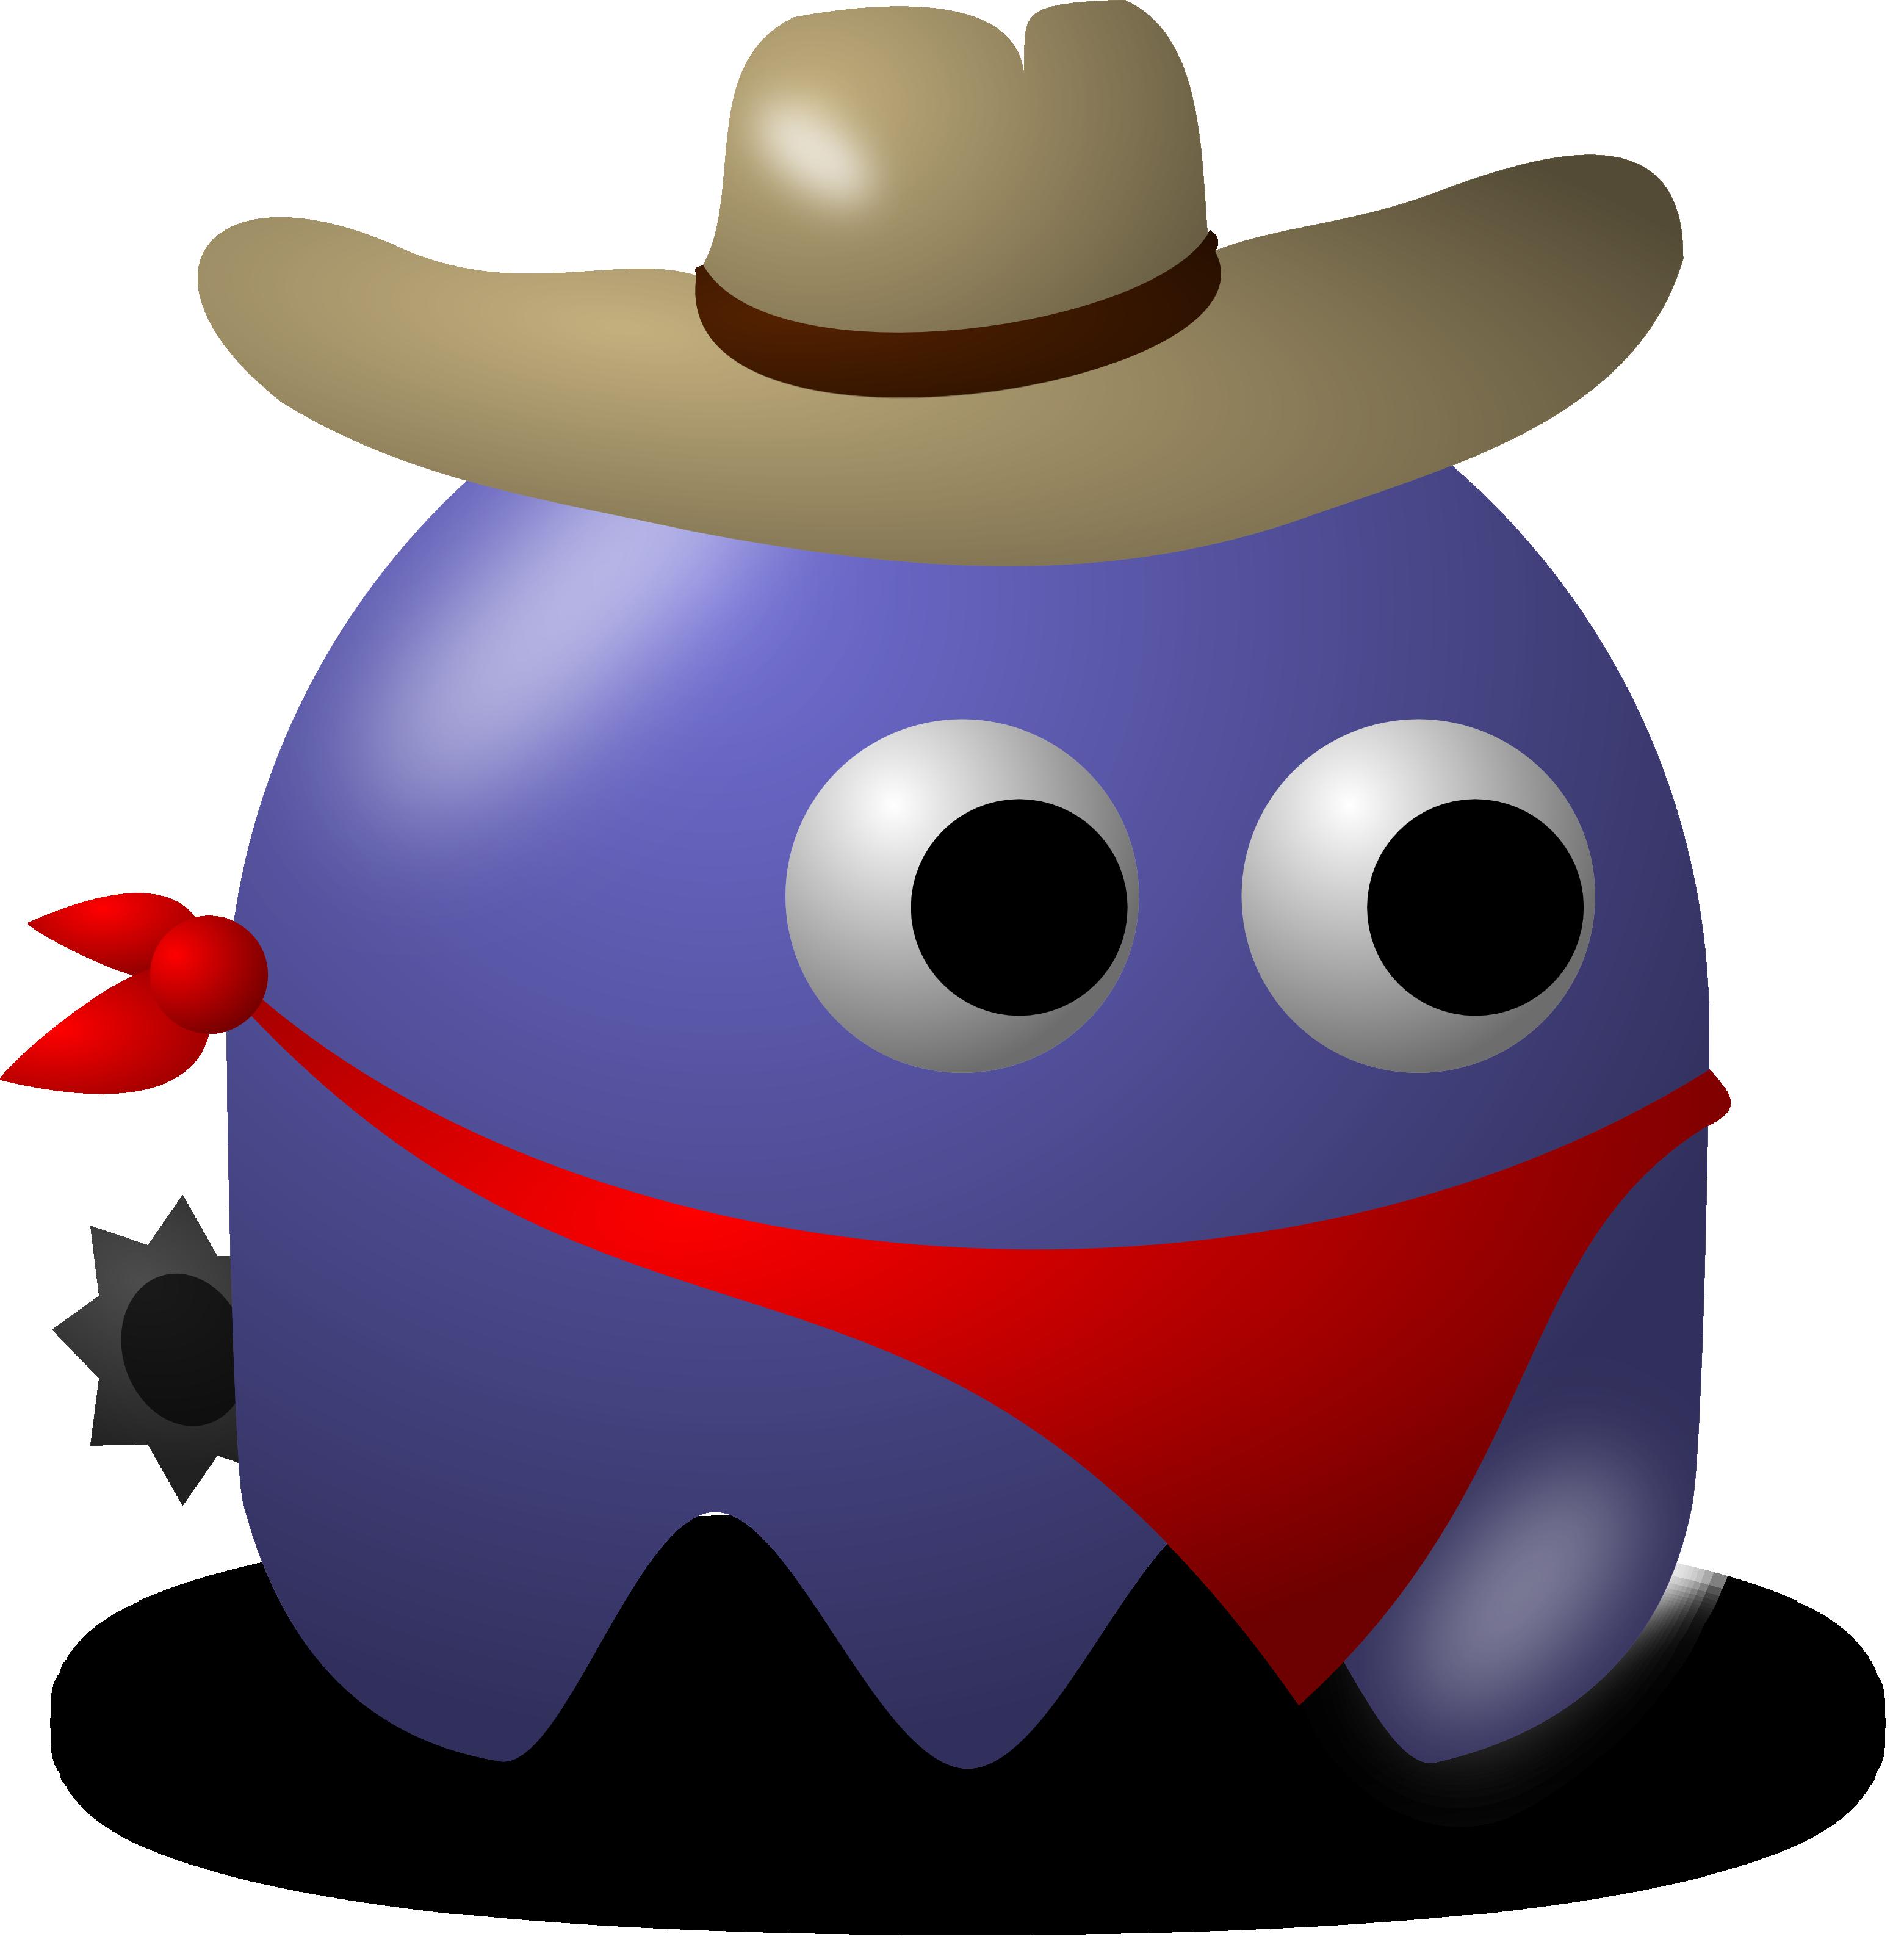 Free image group cowbow. Horseshoe clipart rodeo